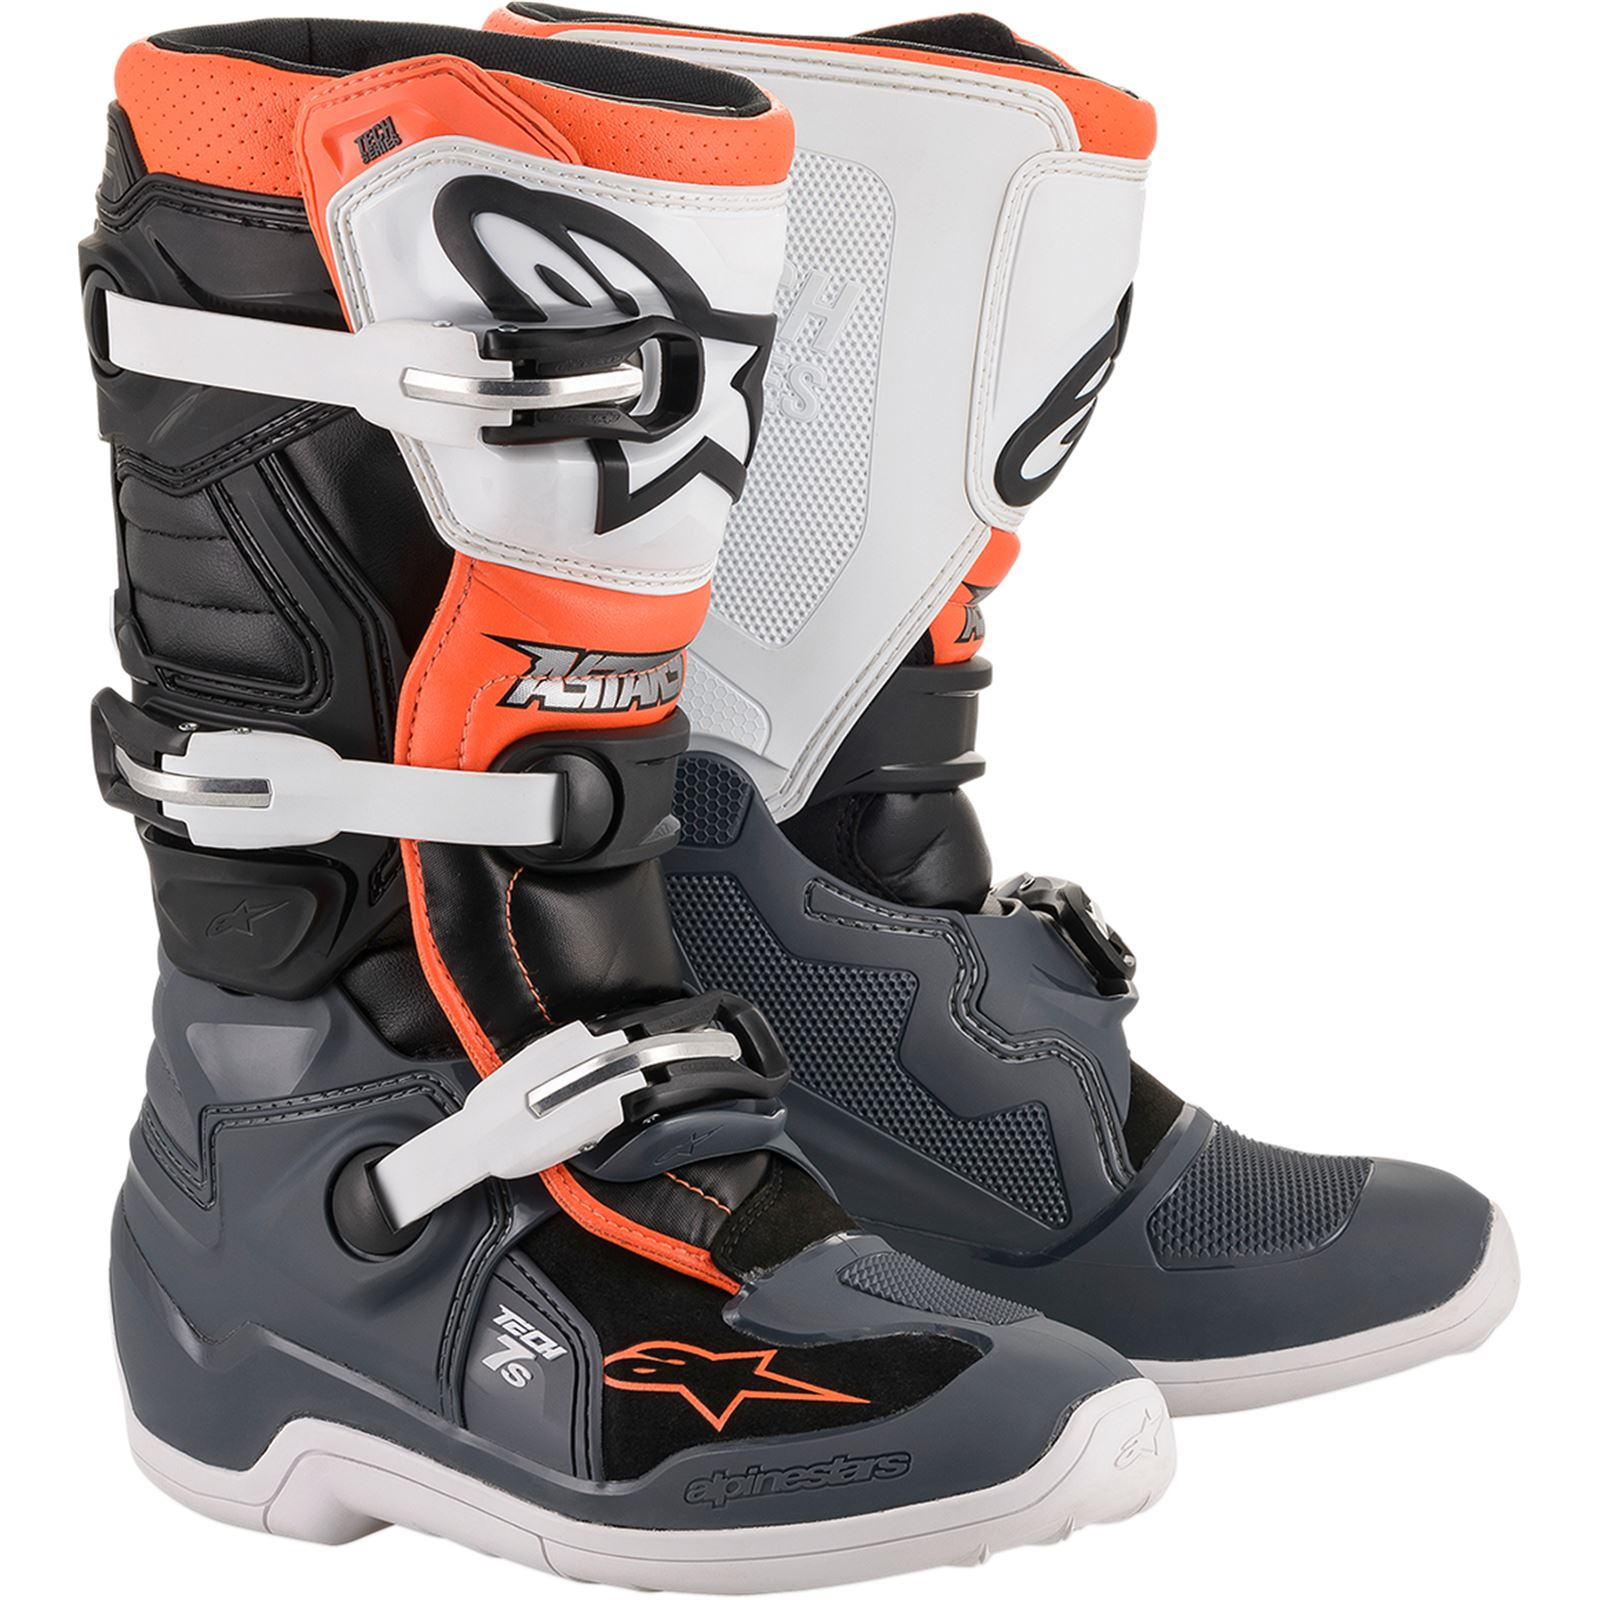 Alpinestars Tech 7S Boot - Black/Grey/White/Orange Fluorescent - Size 3